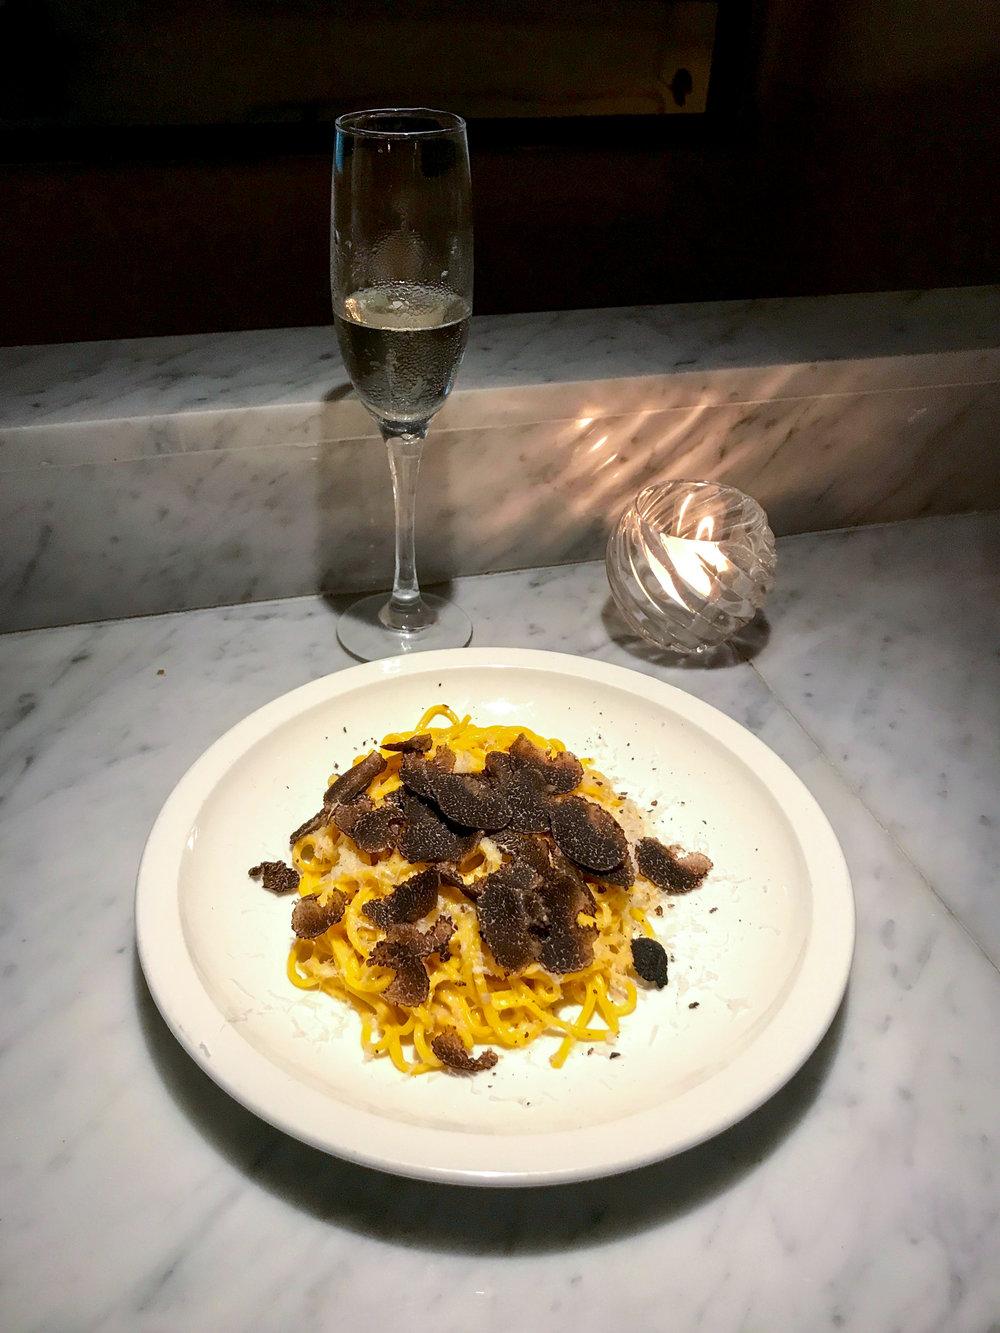 Tagliolini with shallot, white truffle paste, fresh shaved black truffle